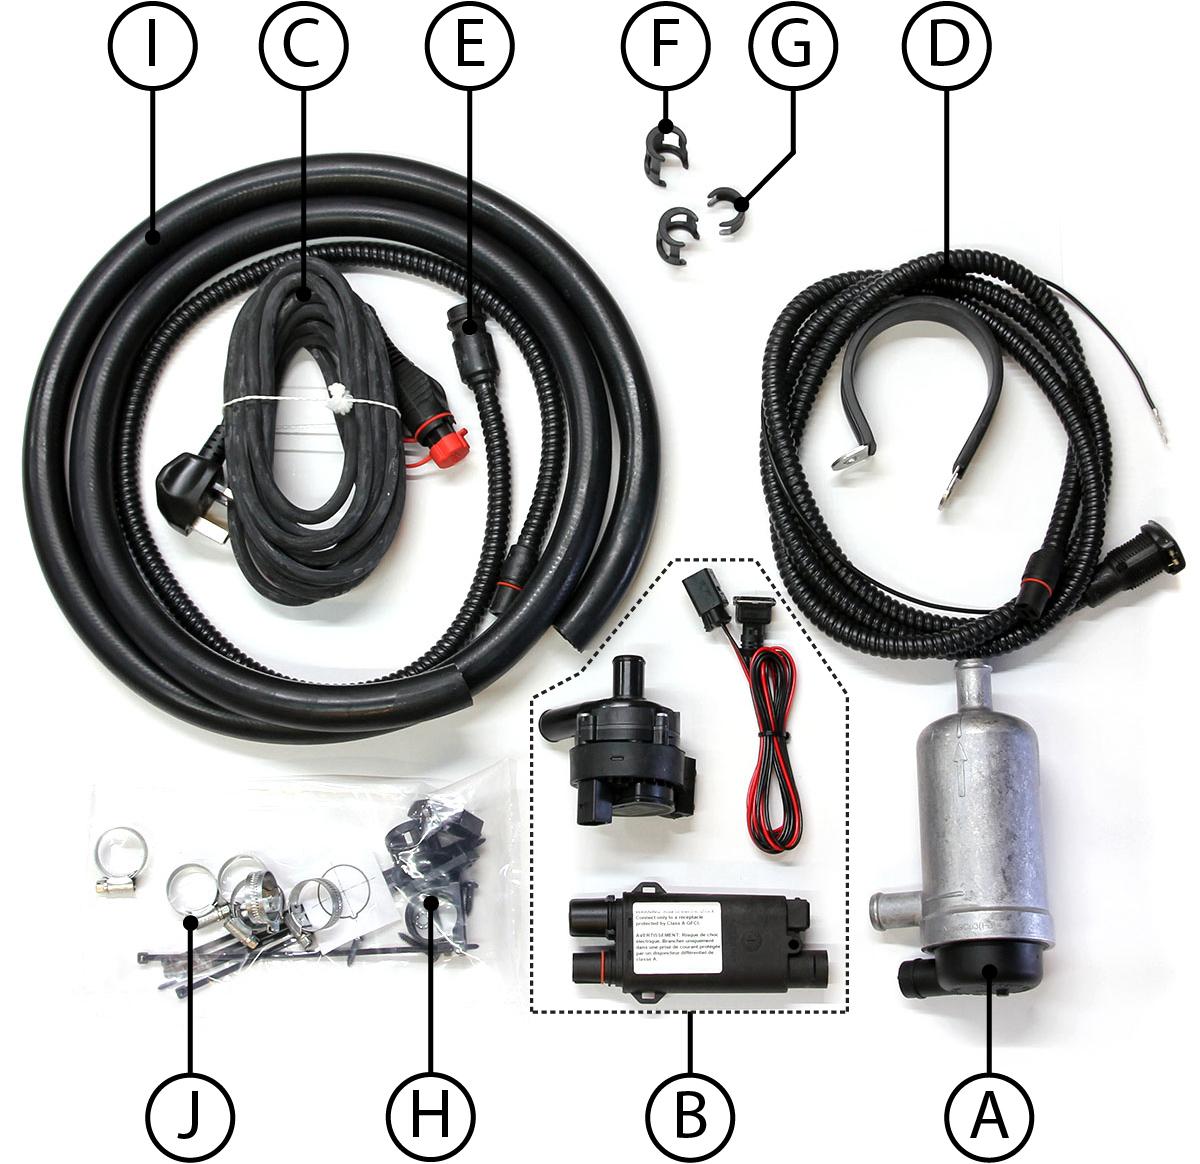 T7Design Engine Pre Heater Kit Contents